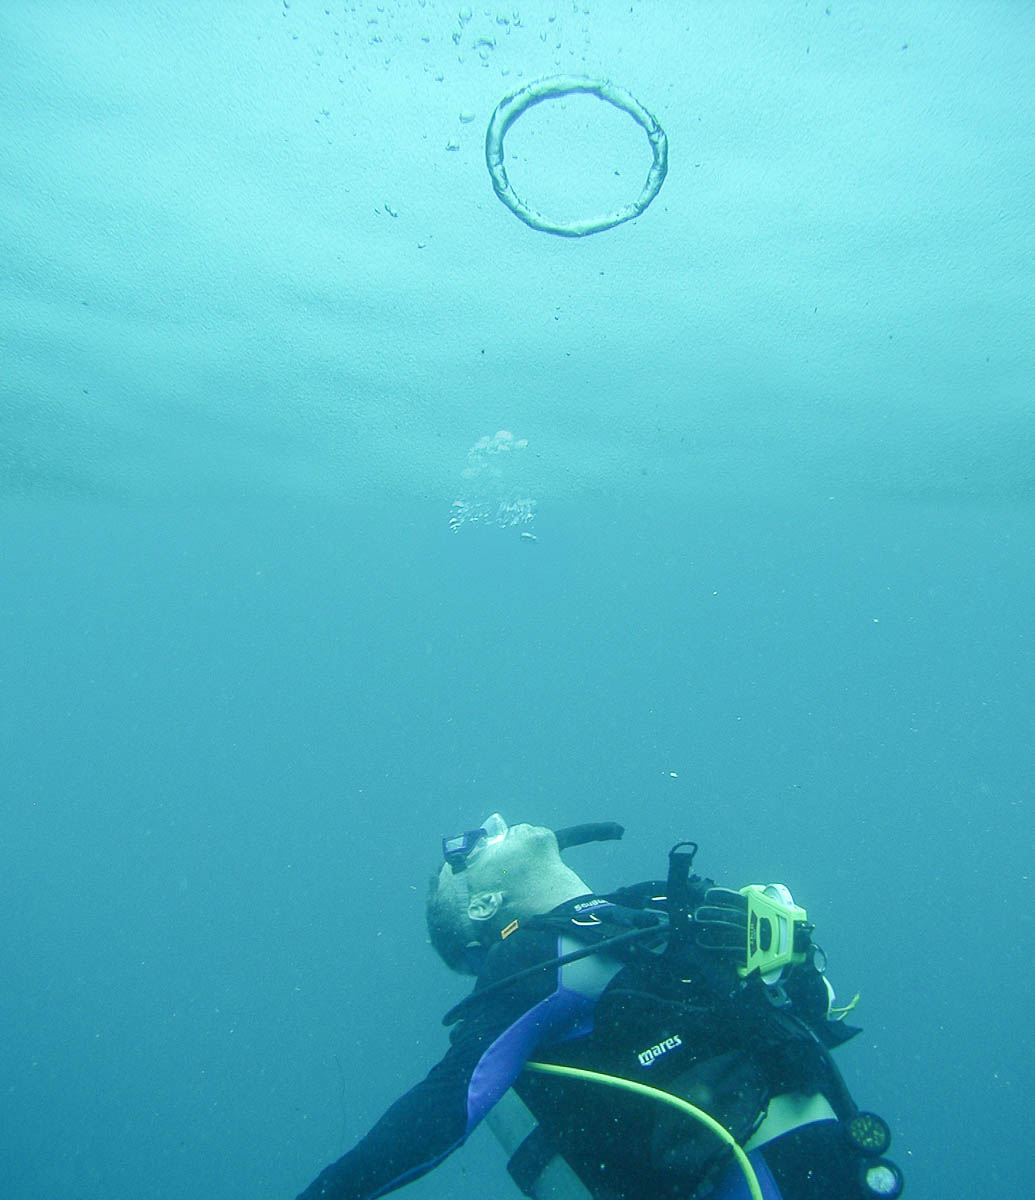 Flip Colmer Scuba diving blowing bubble rings